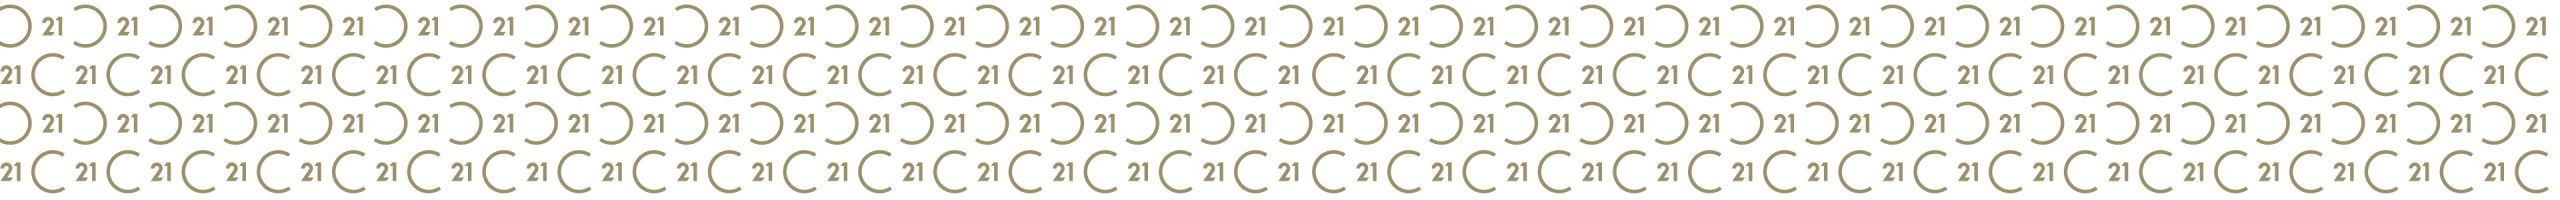 Century 21 brand logo